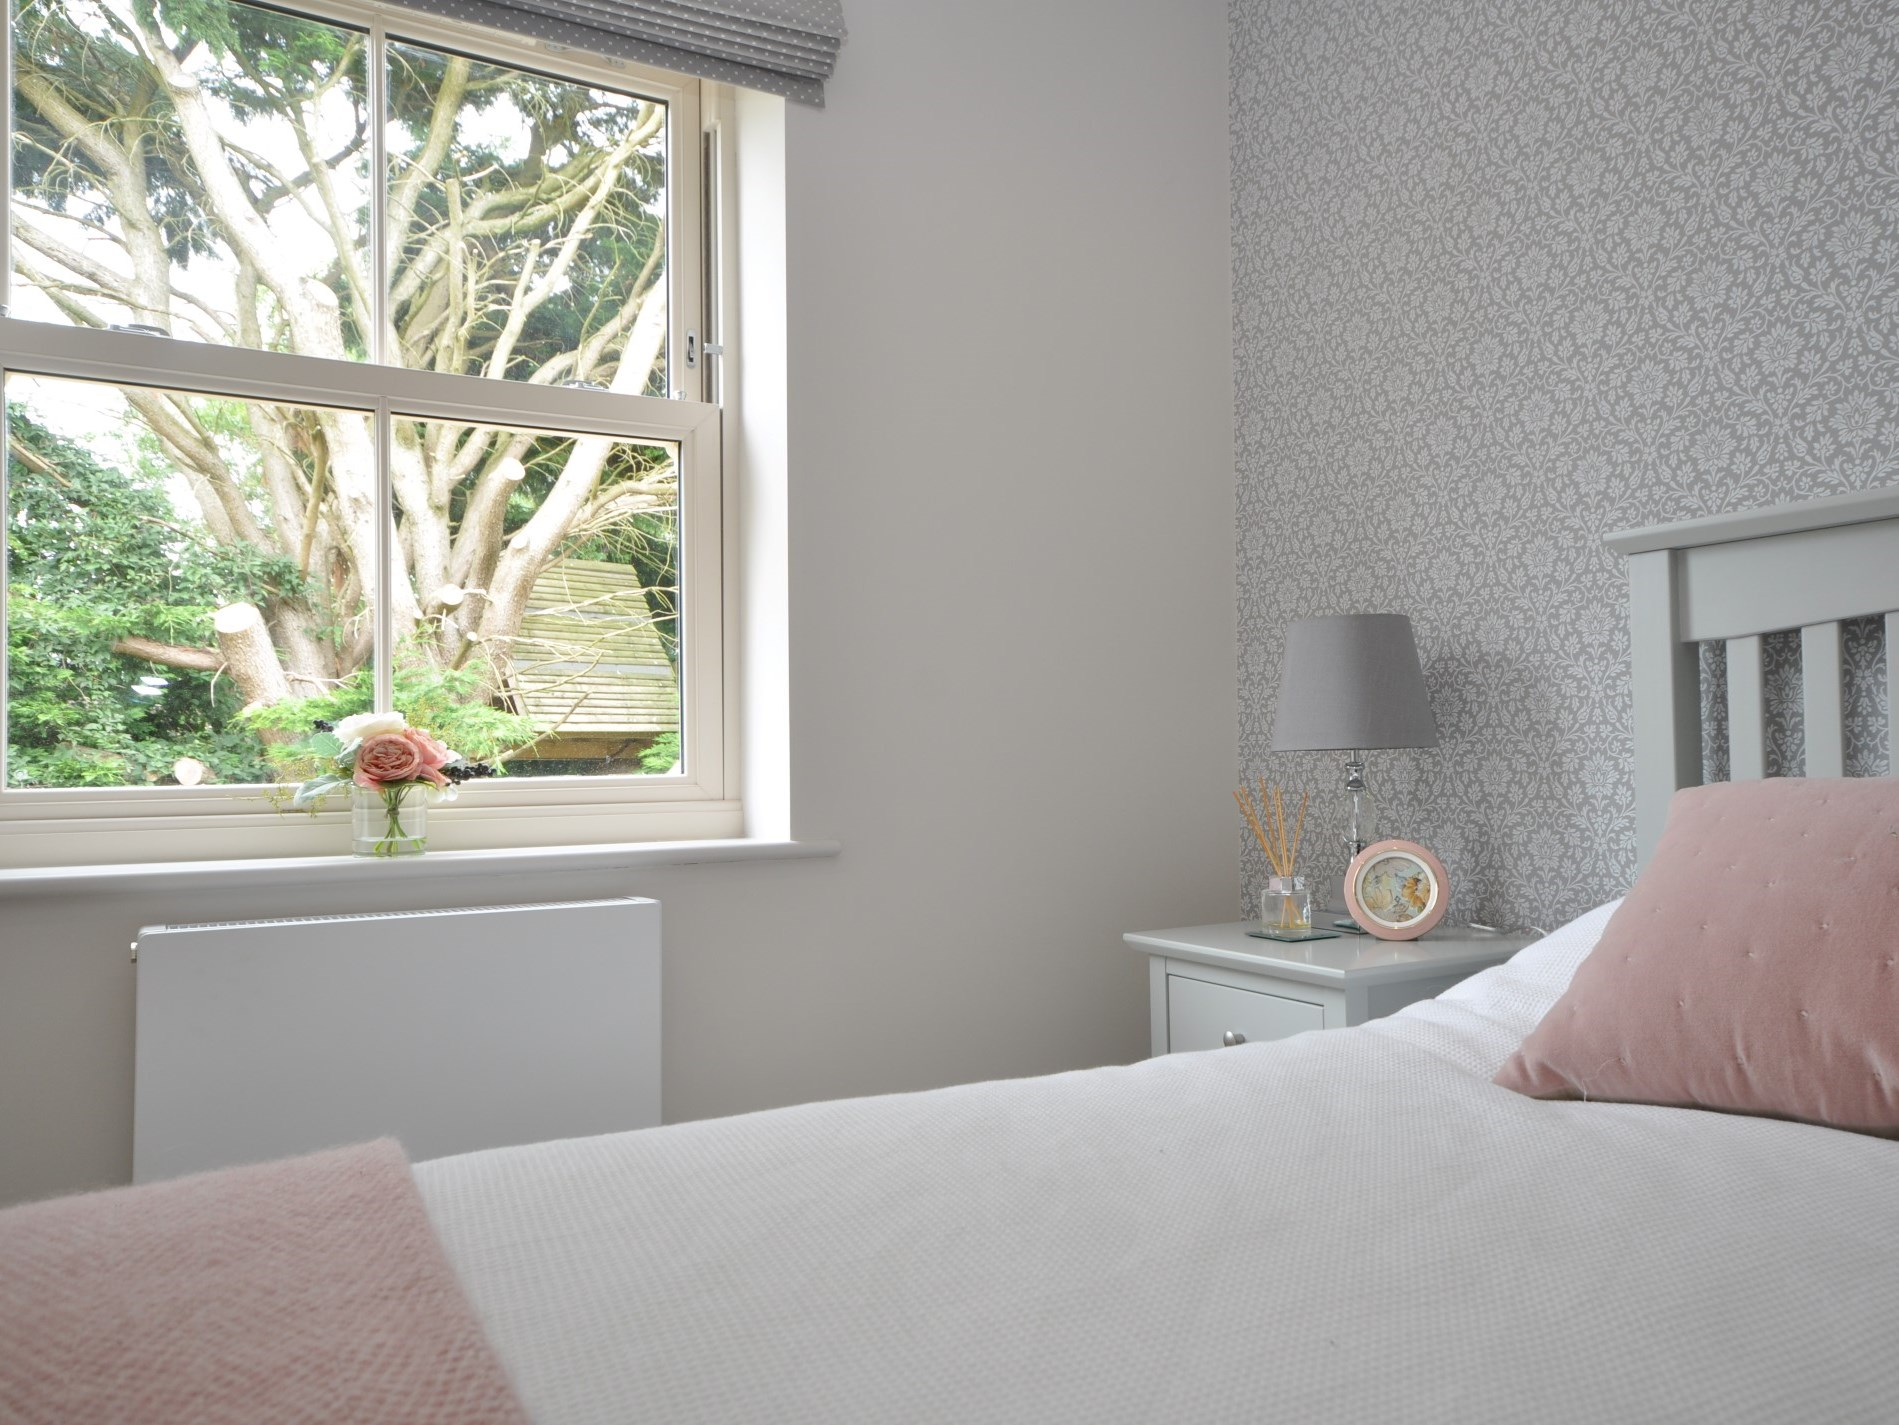 Simple soft furnishings finish the room